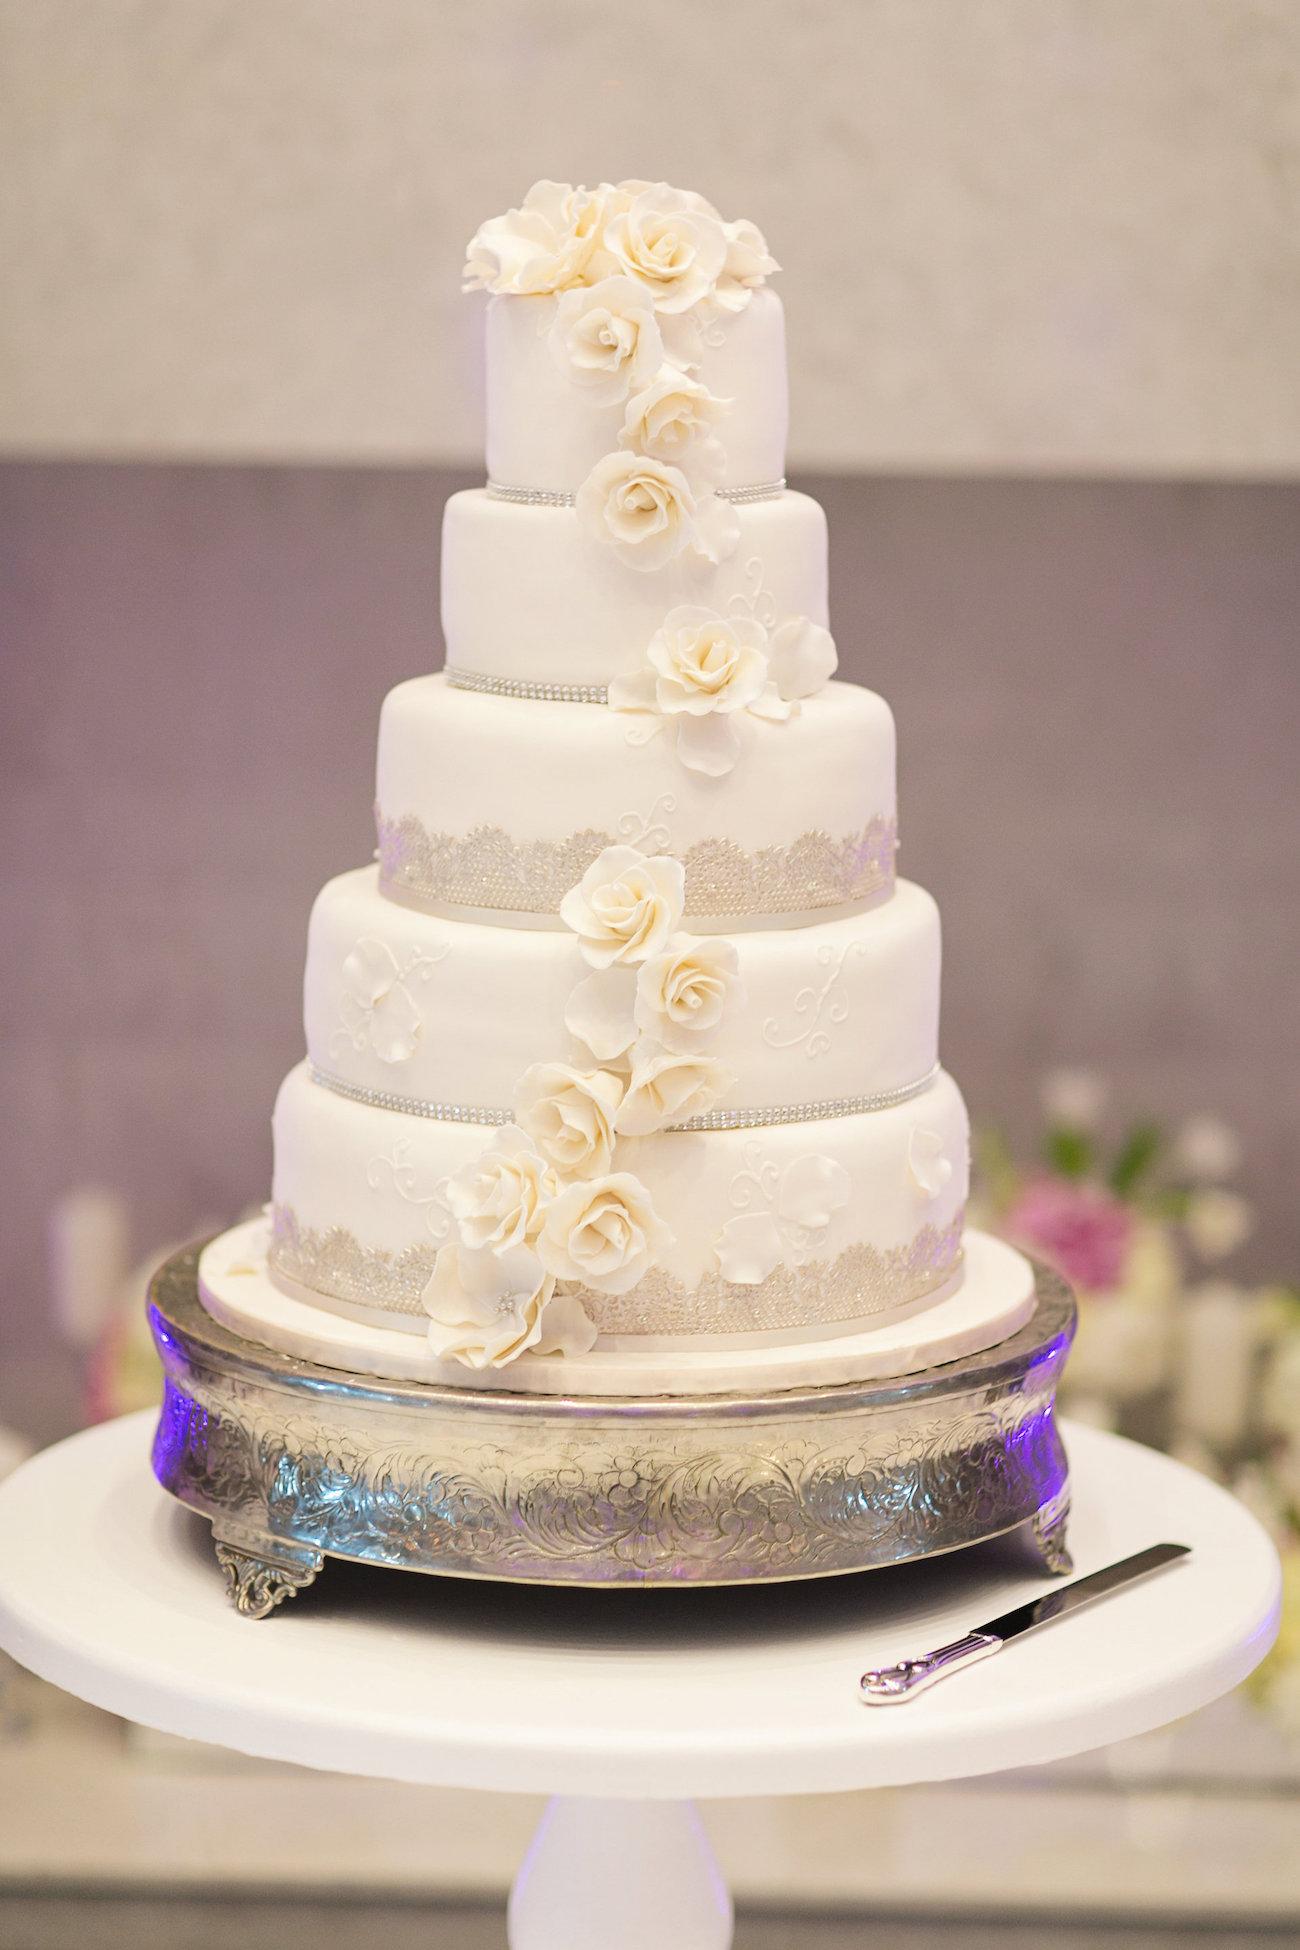 Classic Wedding Cake | Credit: Tyme Photography & Wedding Concepts